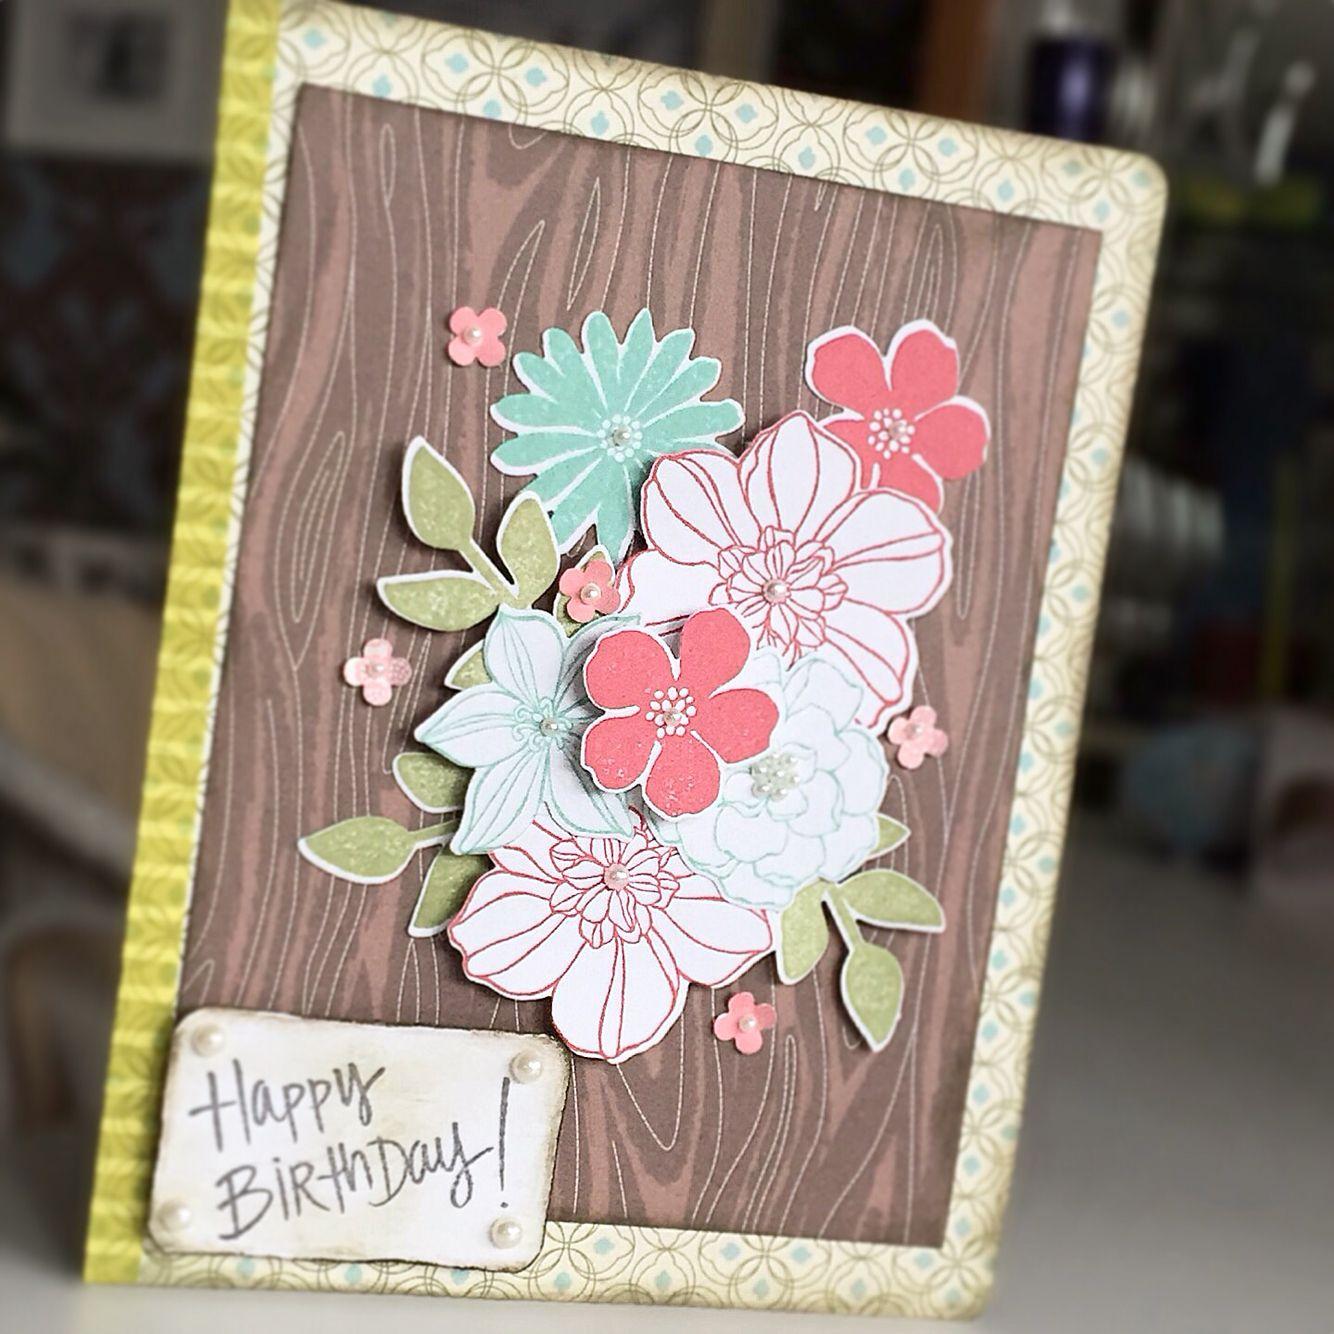 Geburtstagskarte #birthday